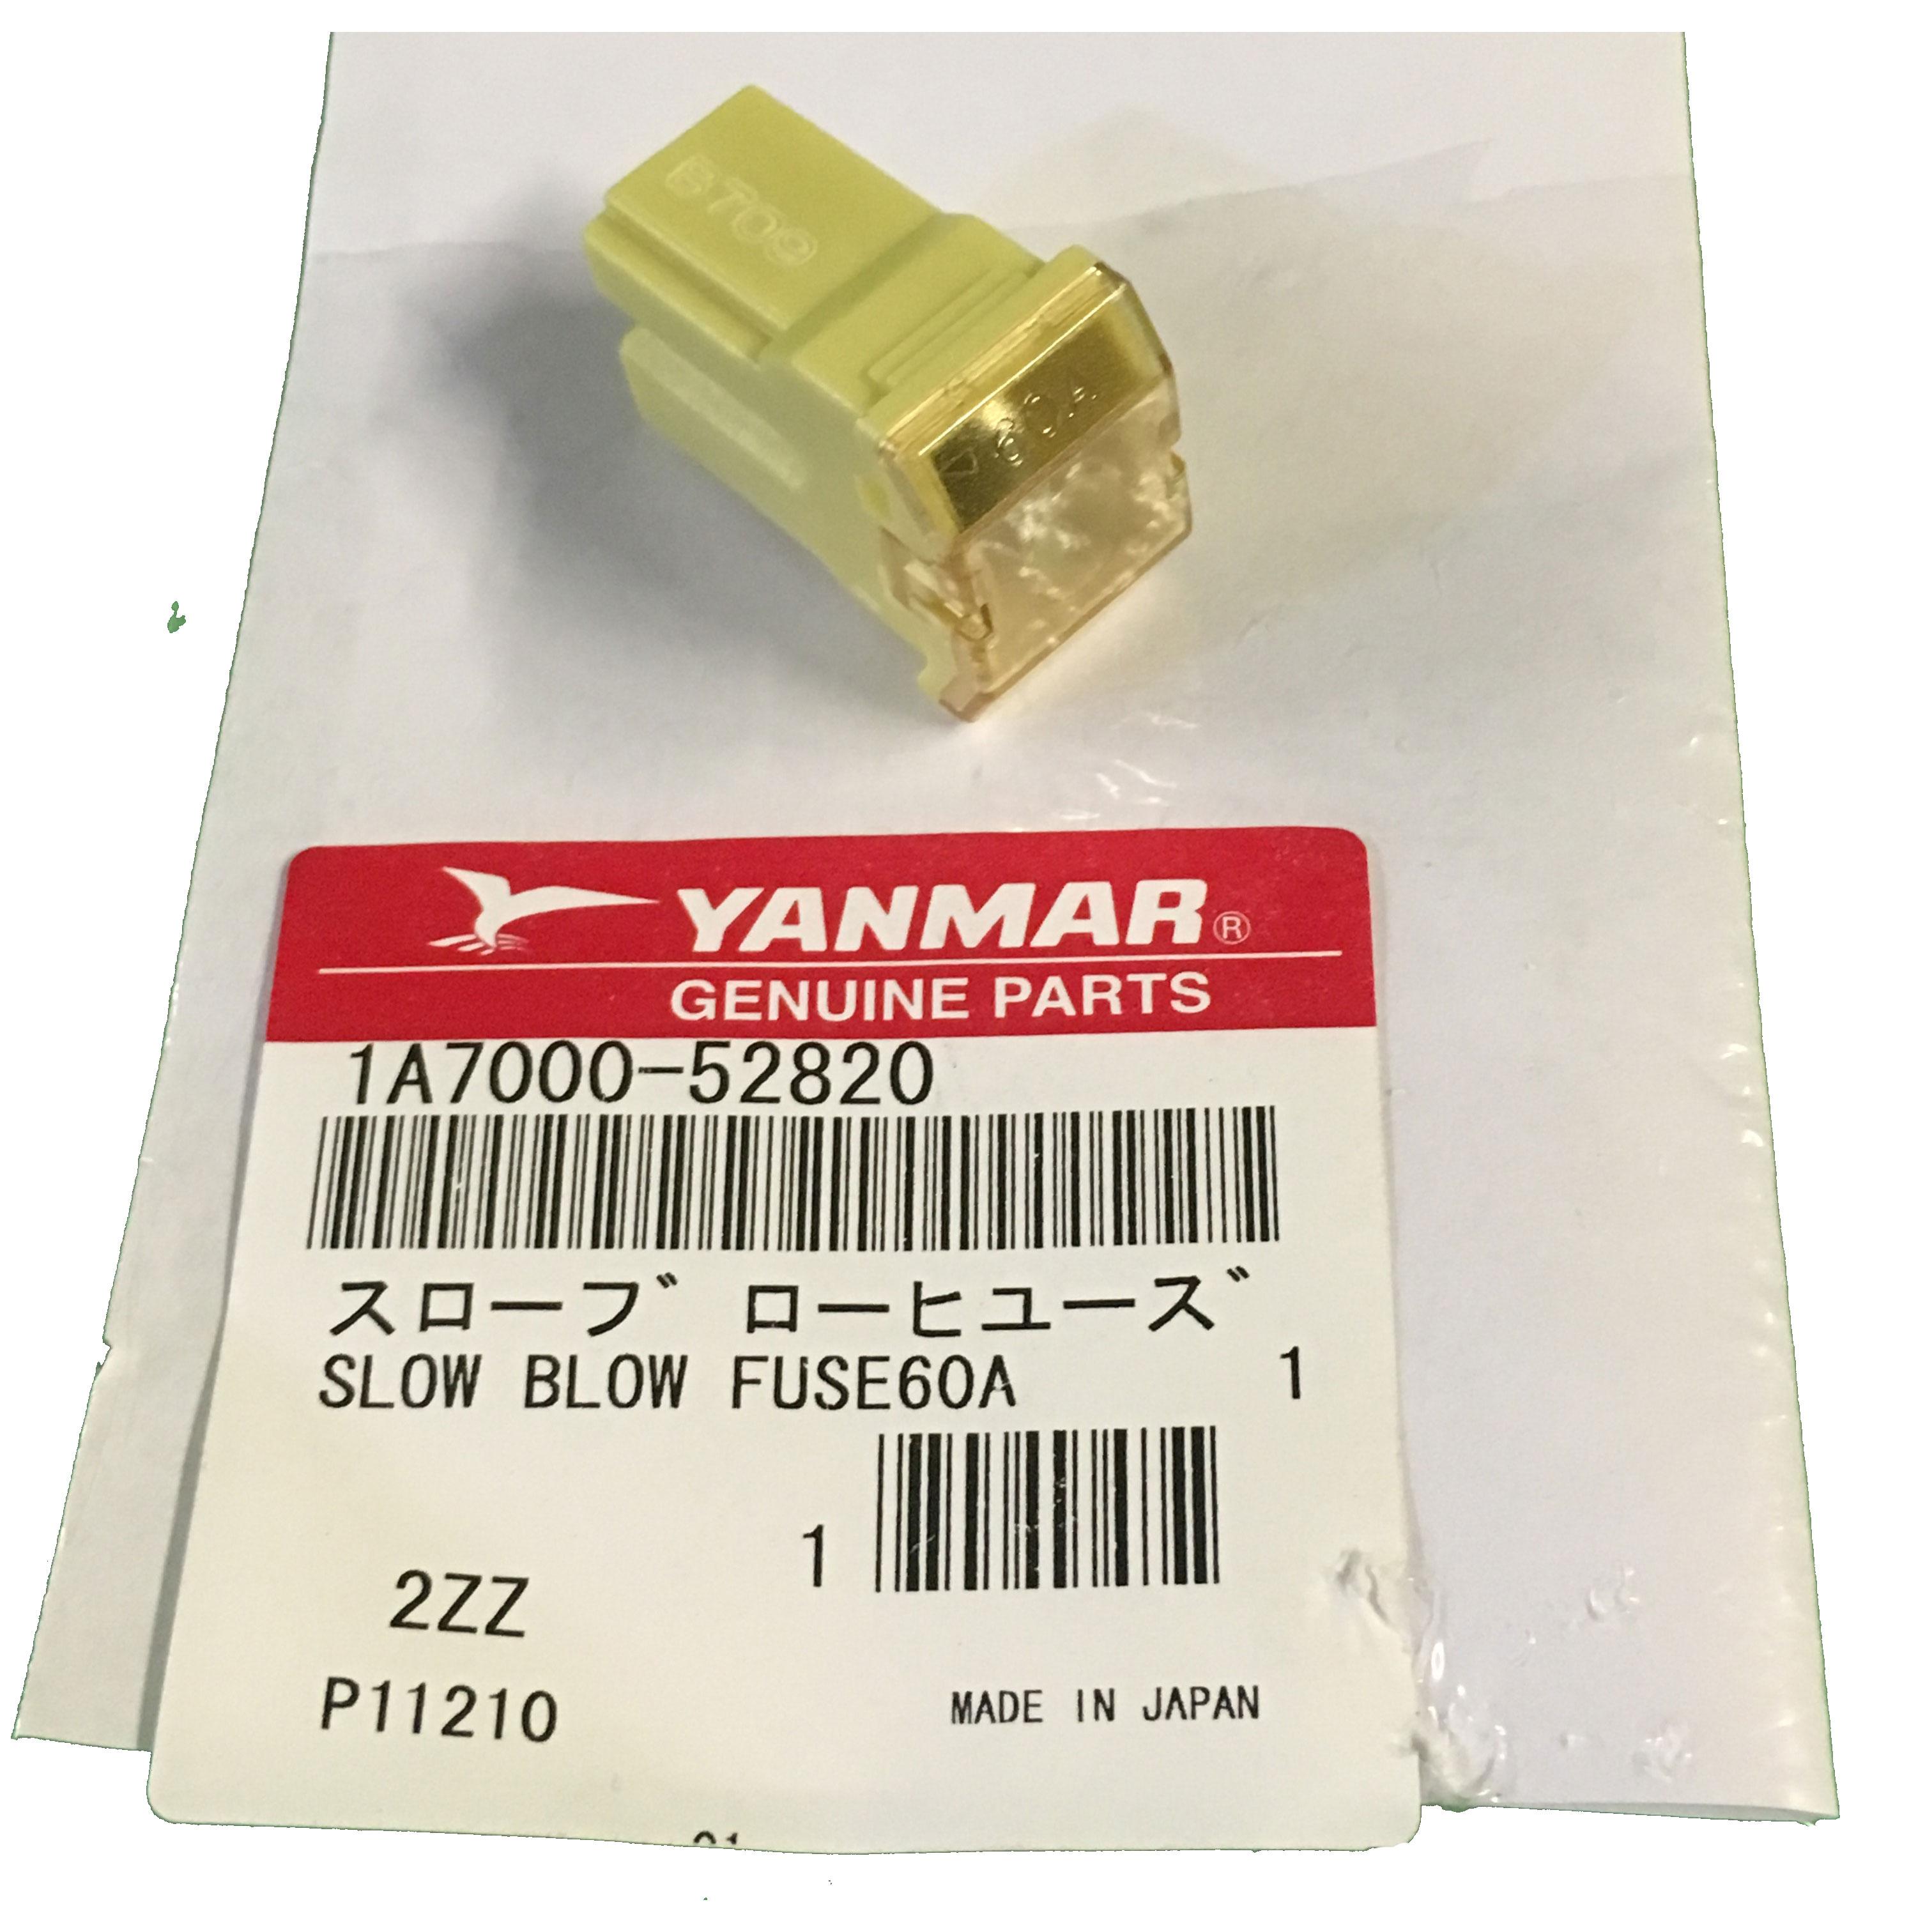 Yanmar 1a7000 52820 Fuse 60a Slow Blow Cub Cadet Power